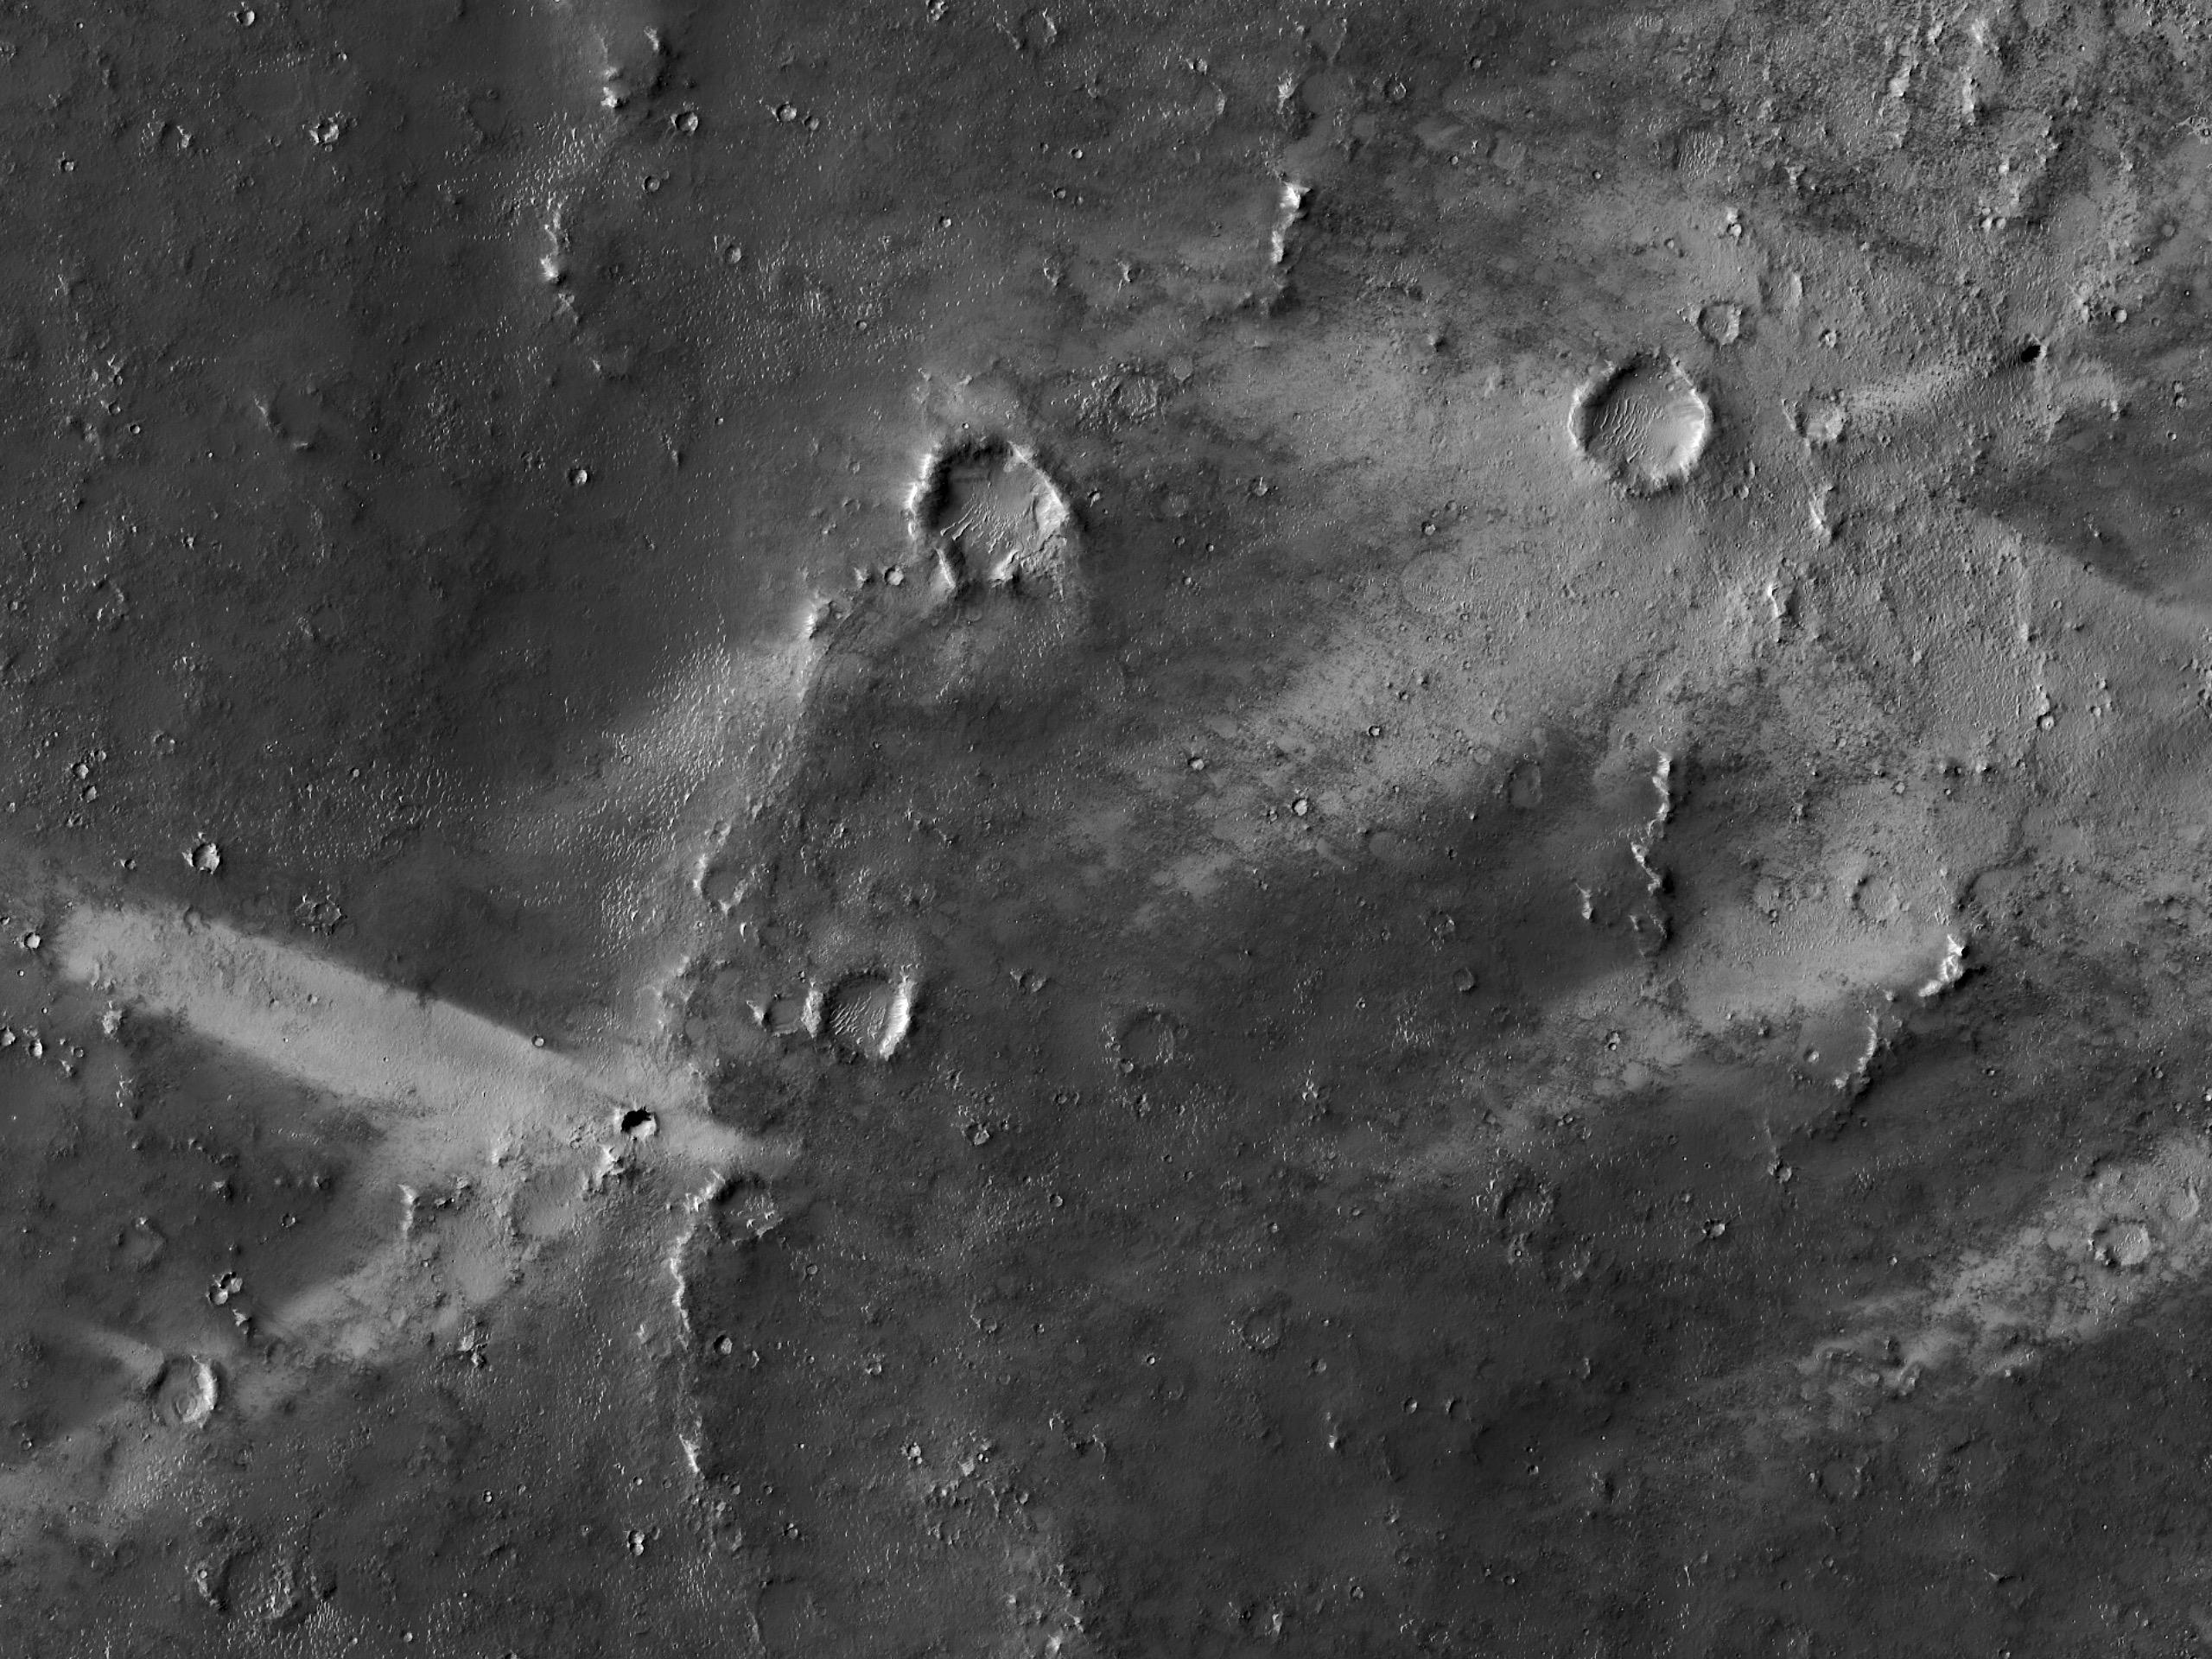 Streaking on Mars